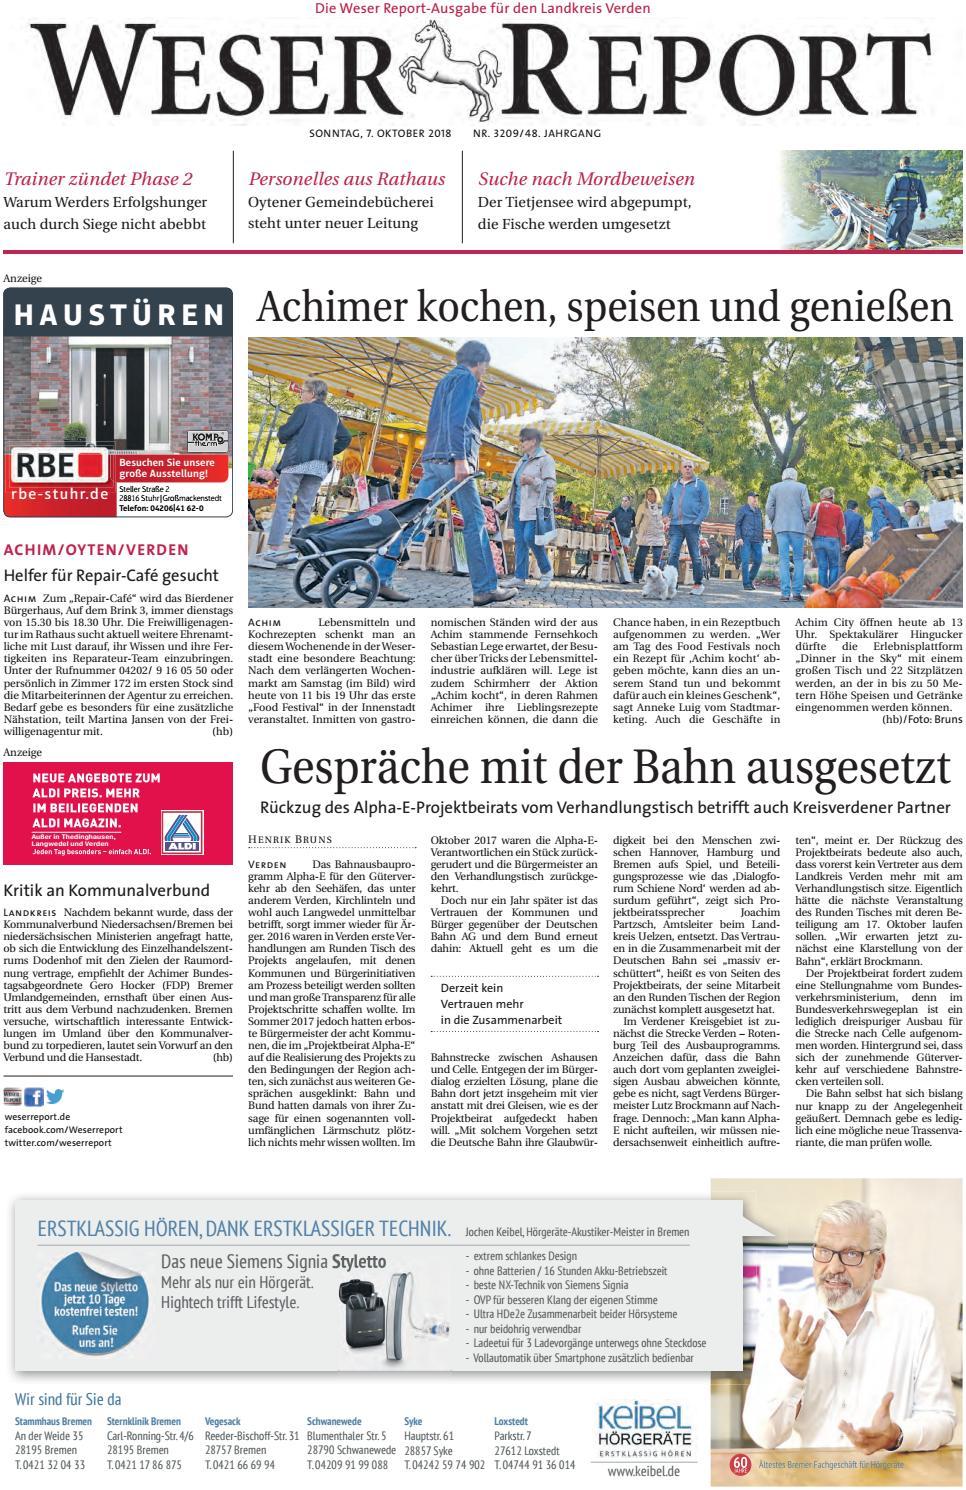 Weser Report - Achim, Oyten, Verden vom 07.10.2018 by KPS  Verlagsgesellschaft mbH - issuu